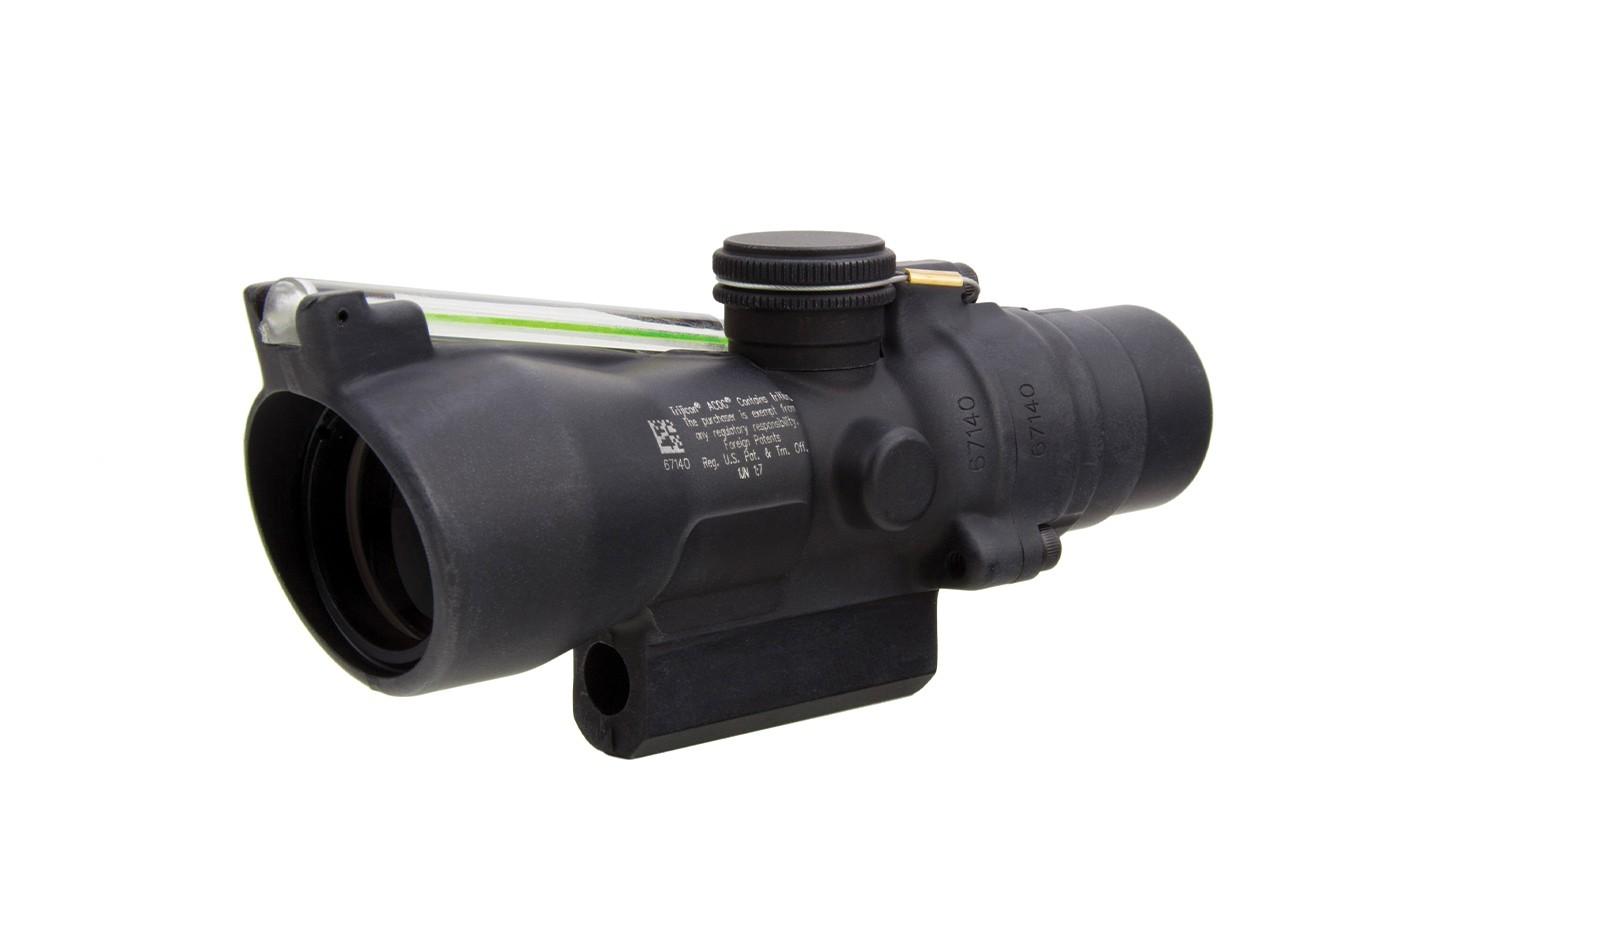 Trijicon ACOG® 3x24 XB Crossbow Scope - 300 -340 fps